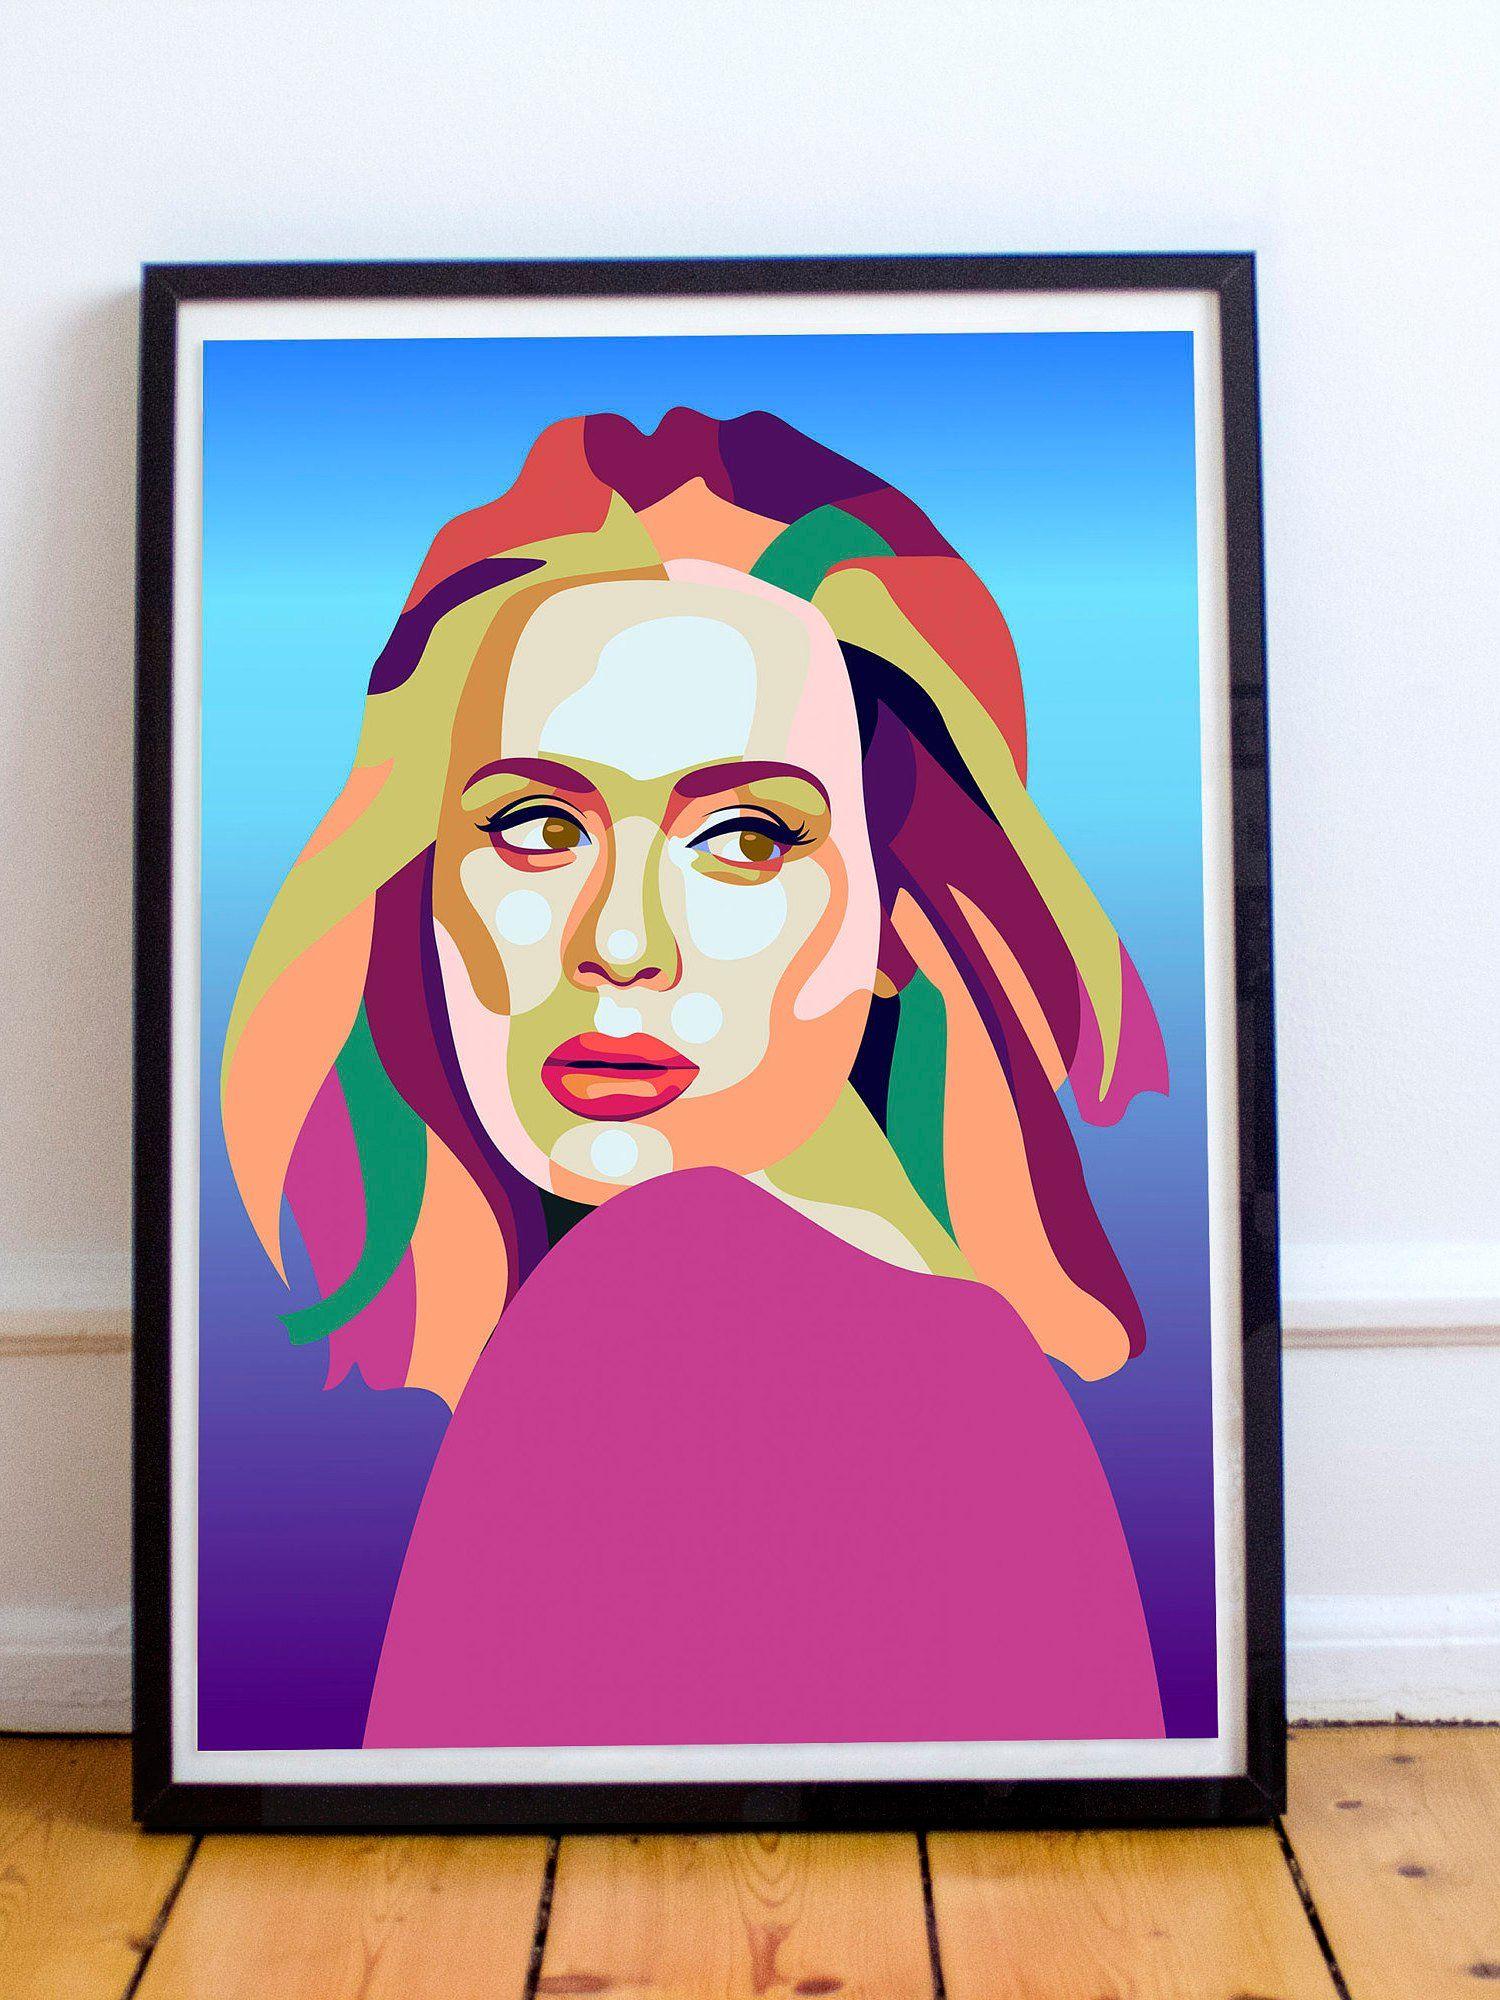 New Adele Inspired Pop Art A3 Music Poster 11 X17 Music Icon Fan Art Wall Art